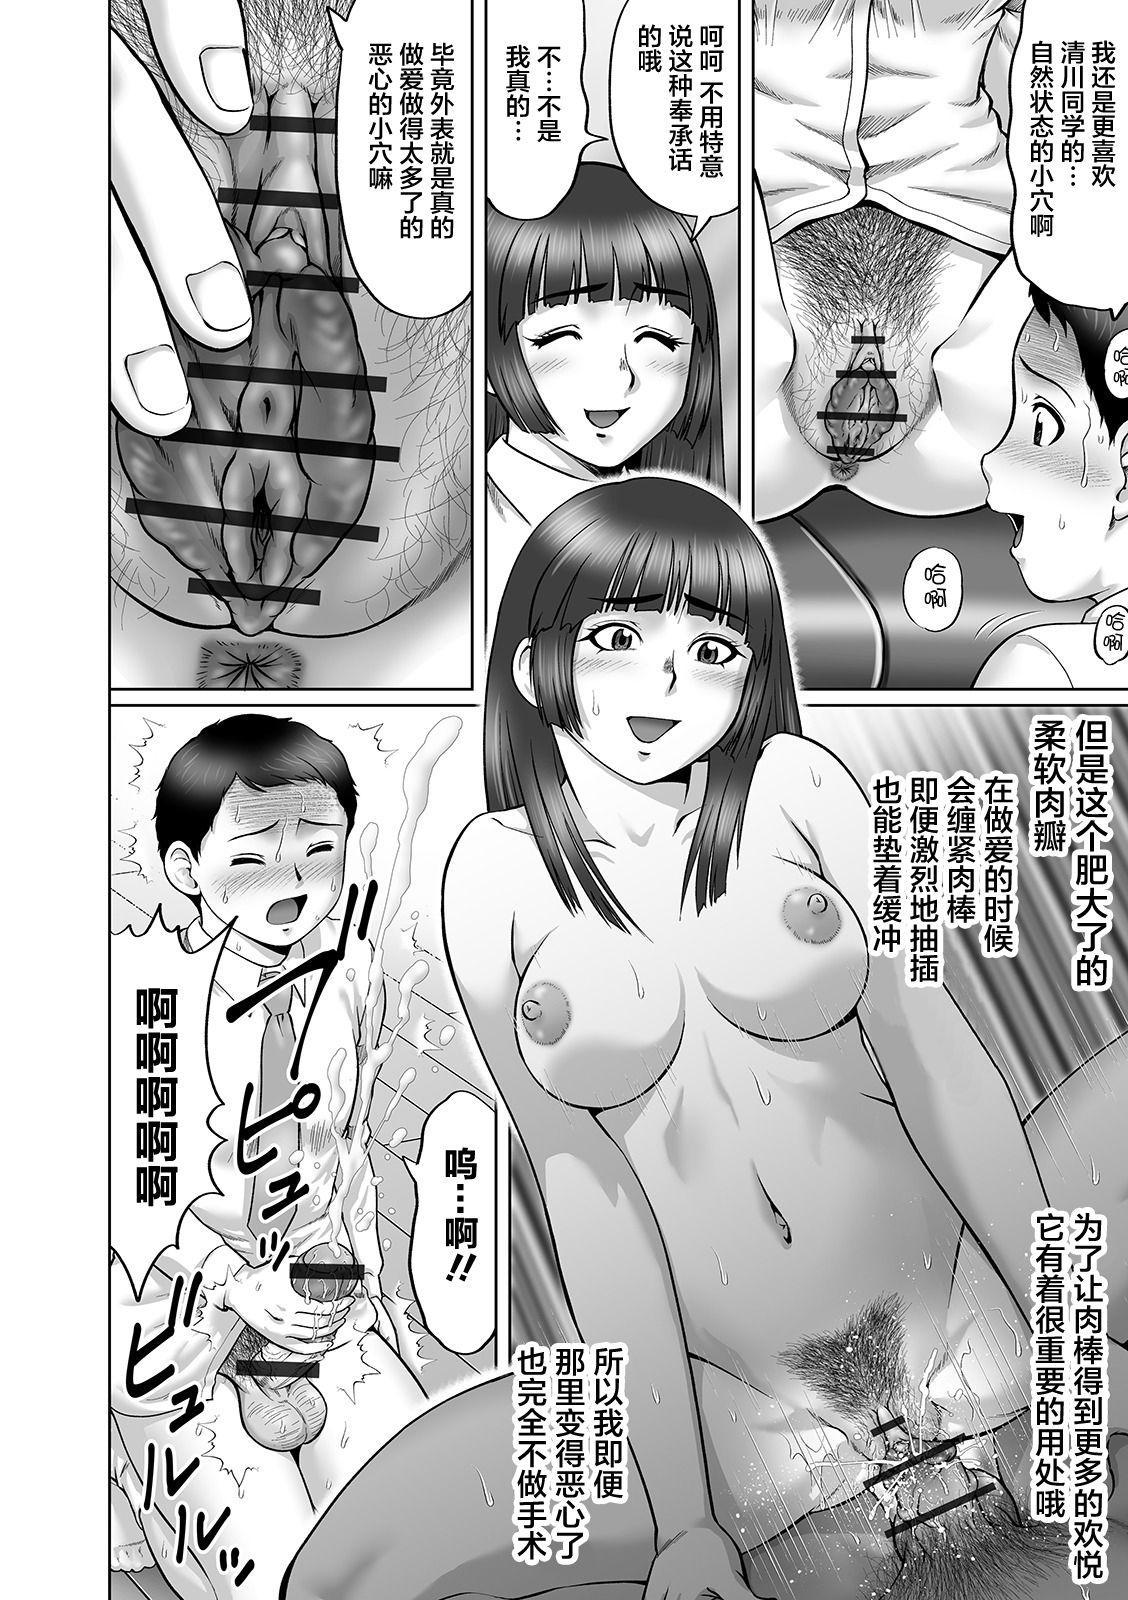 Sonna Tomodachi 9